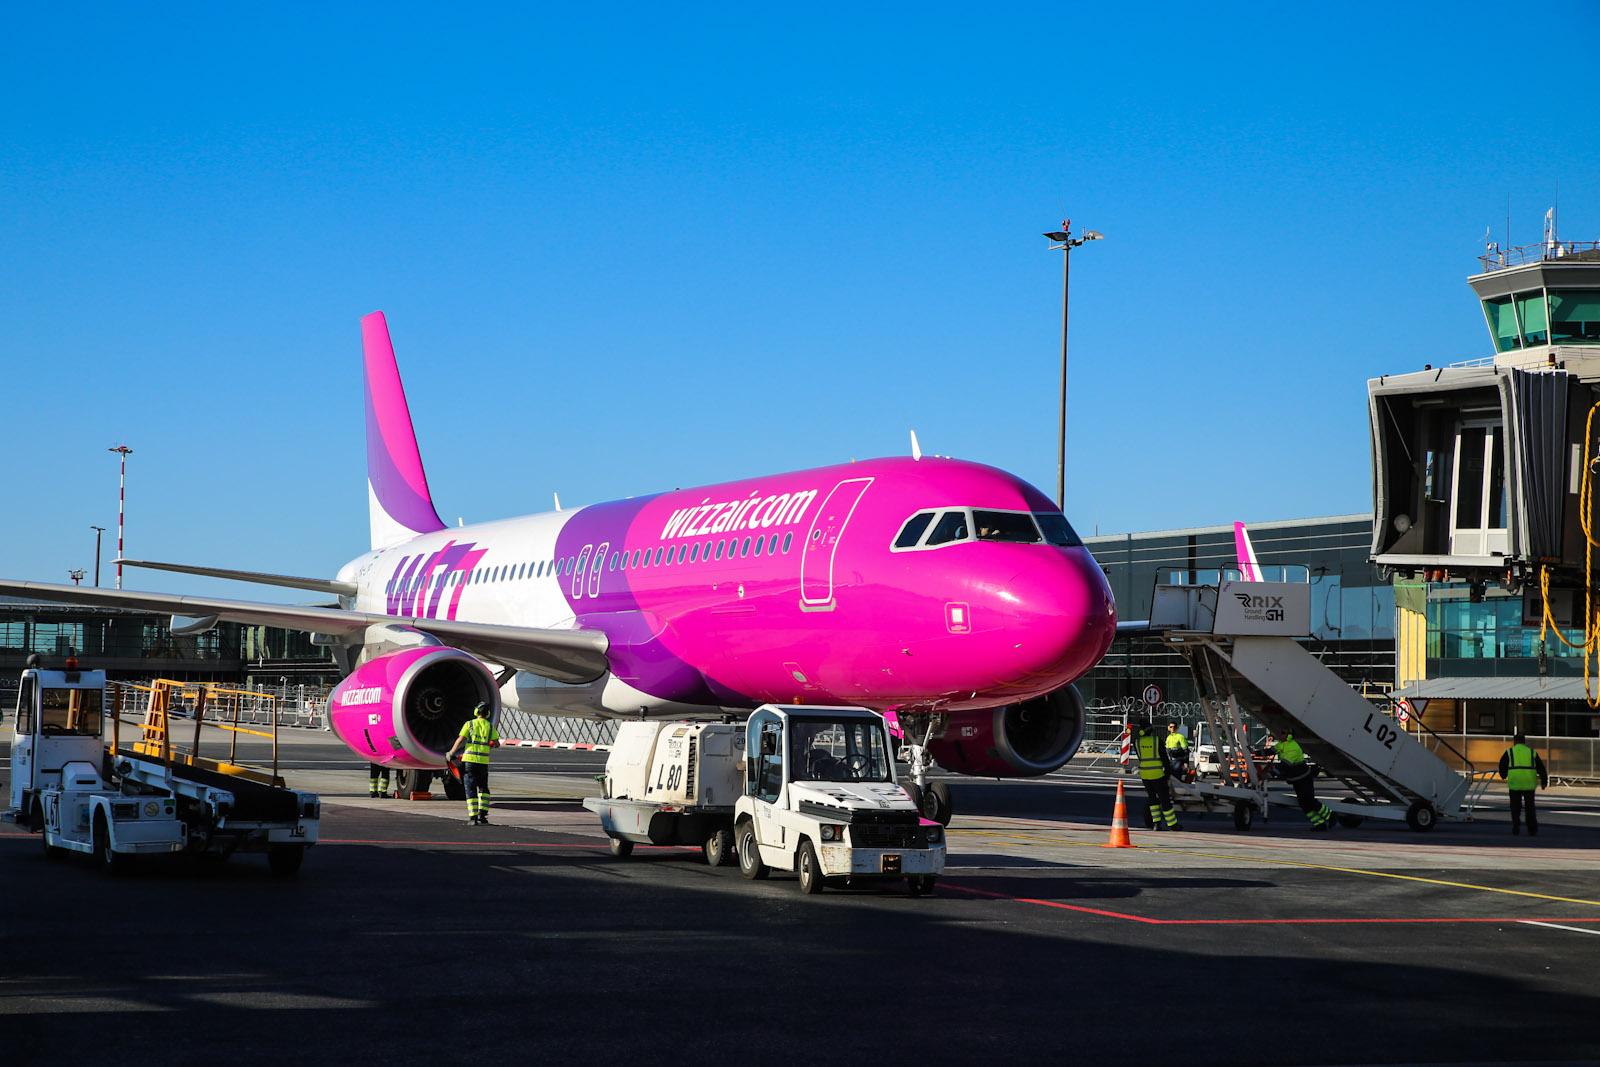 Airbus A320 авиакомпании Wizz Air в аэропорту Рига